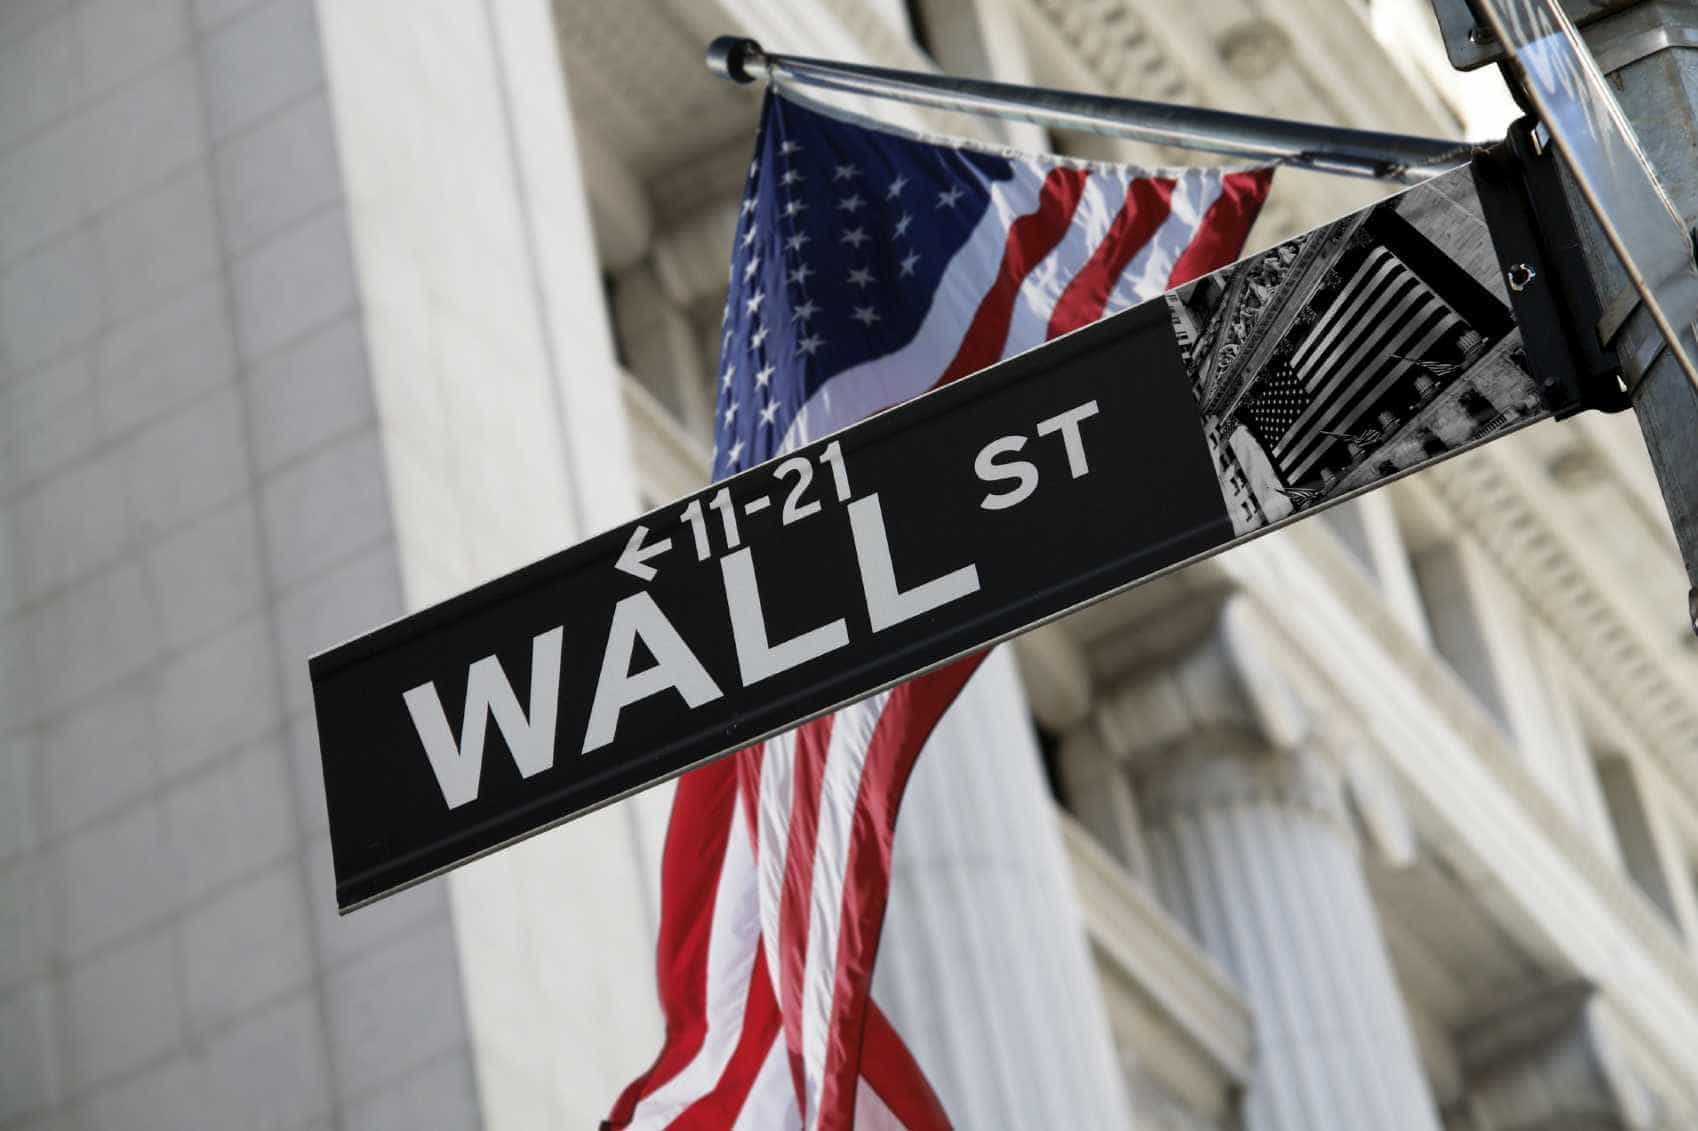 Wall Street fecha em forte baixa, analista fala em naufrágio